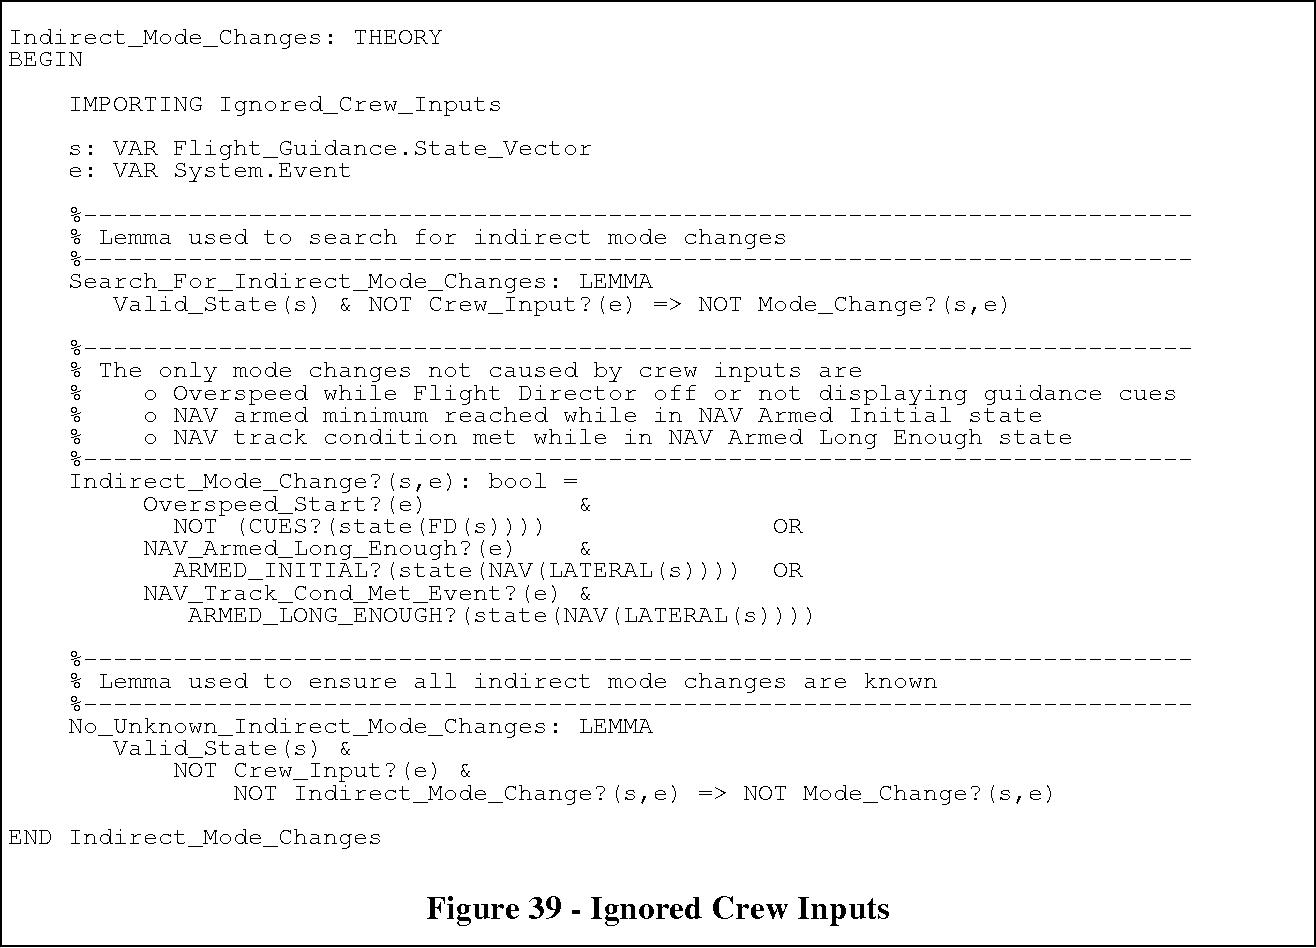 Figure 39 - Ignored Crew Inputs